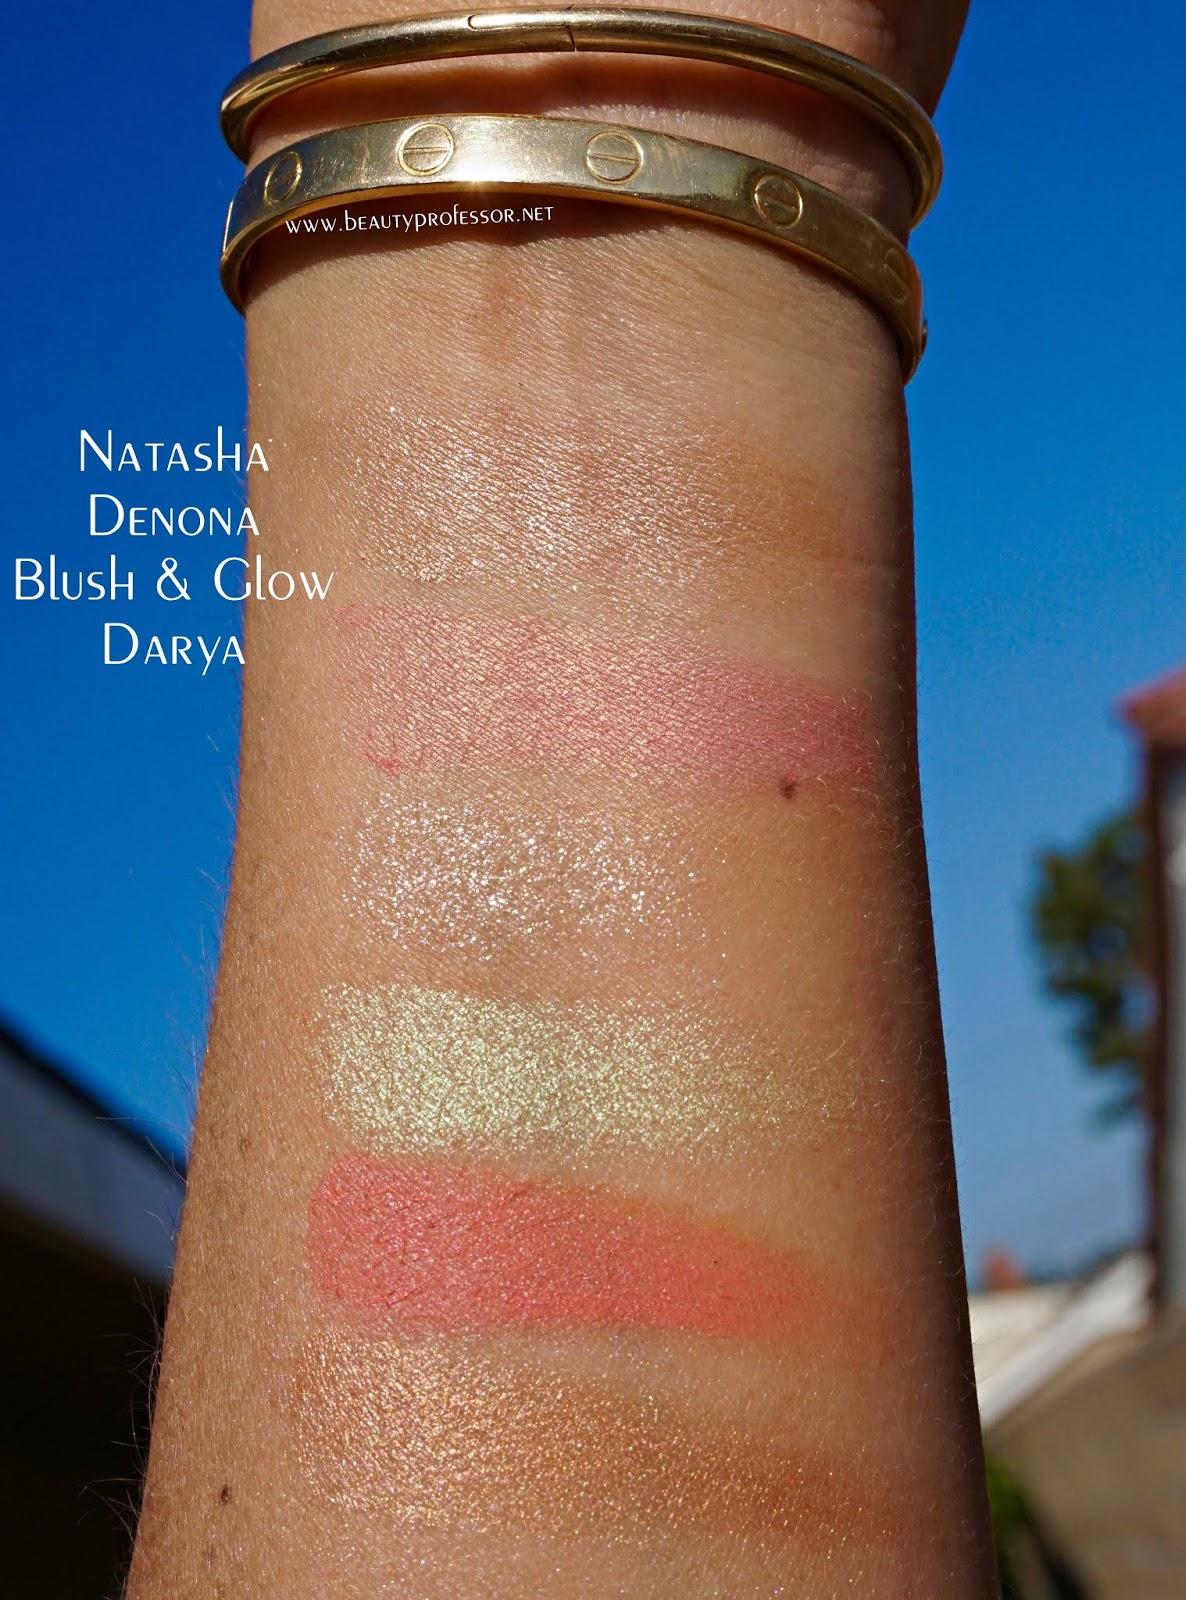 Natasha denona blush and glow darya swatches